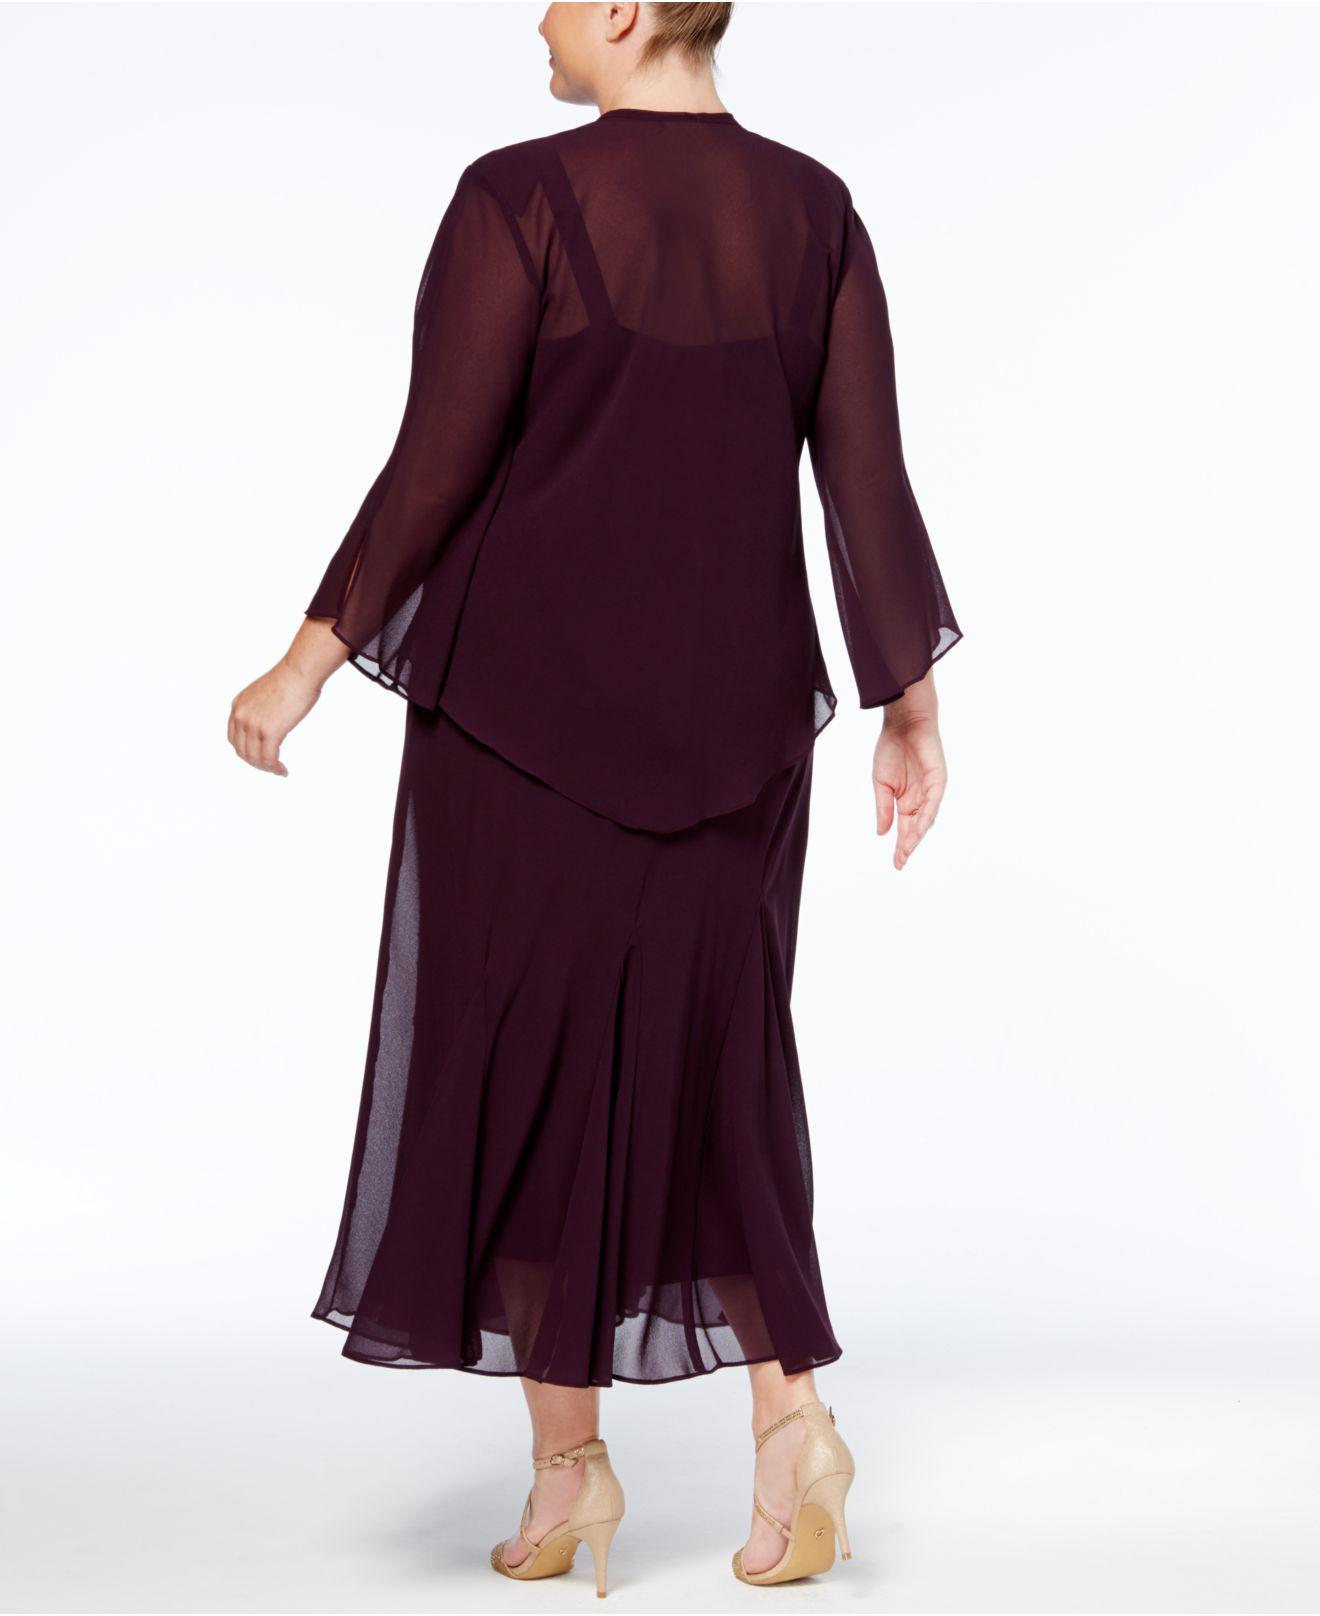 a62e991be6 R   M Richards Plus Size Dress And Jacket